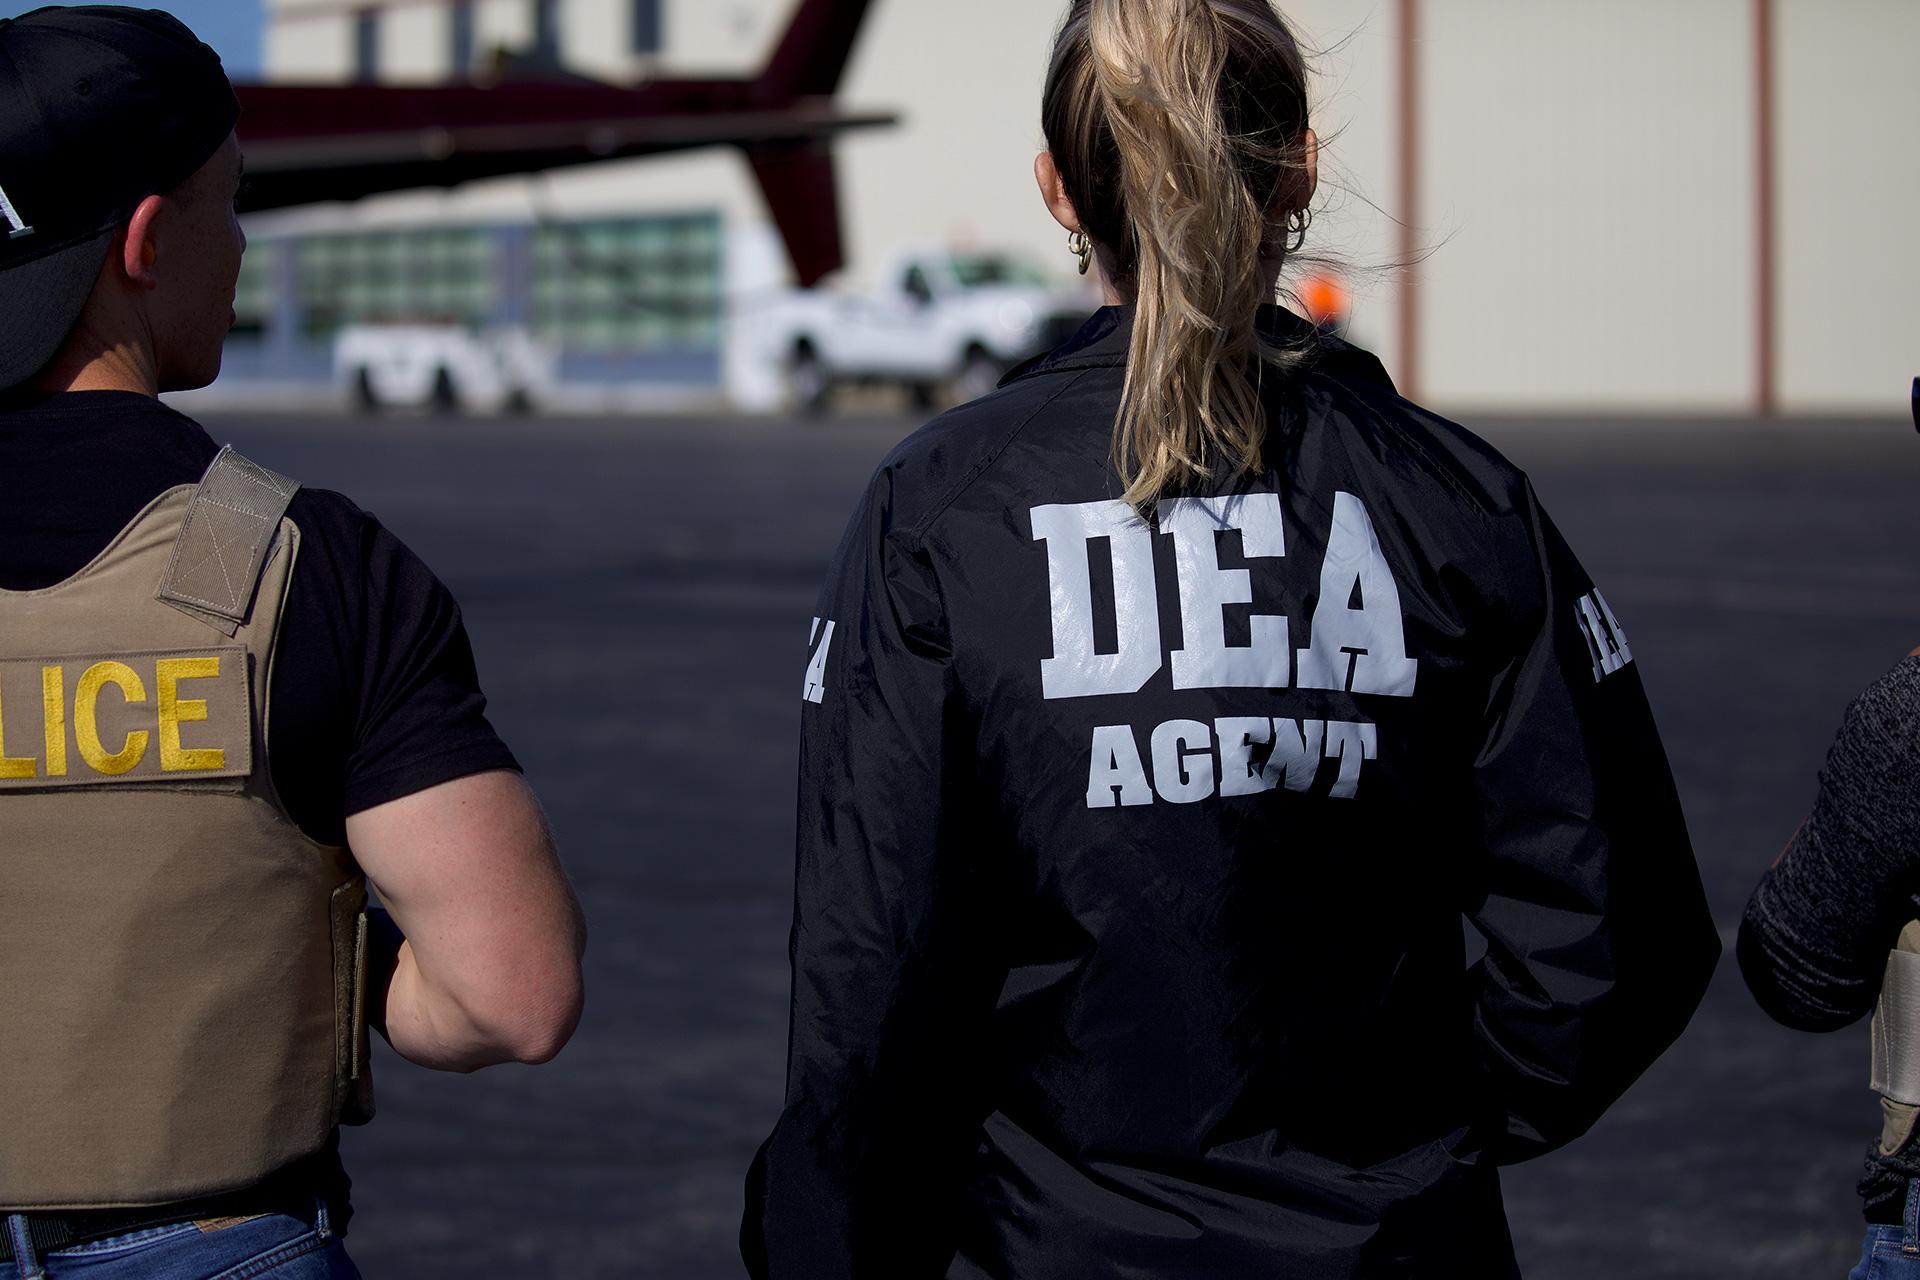 dea, dea pills, dea Operation Crystal Shield, Operation Crystal Shield, methamphetamine, meth, dea meth, dea methamphetamine